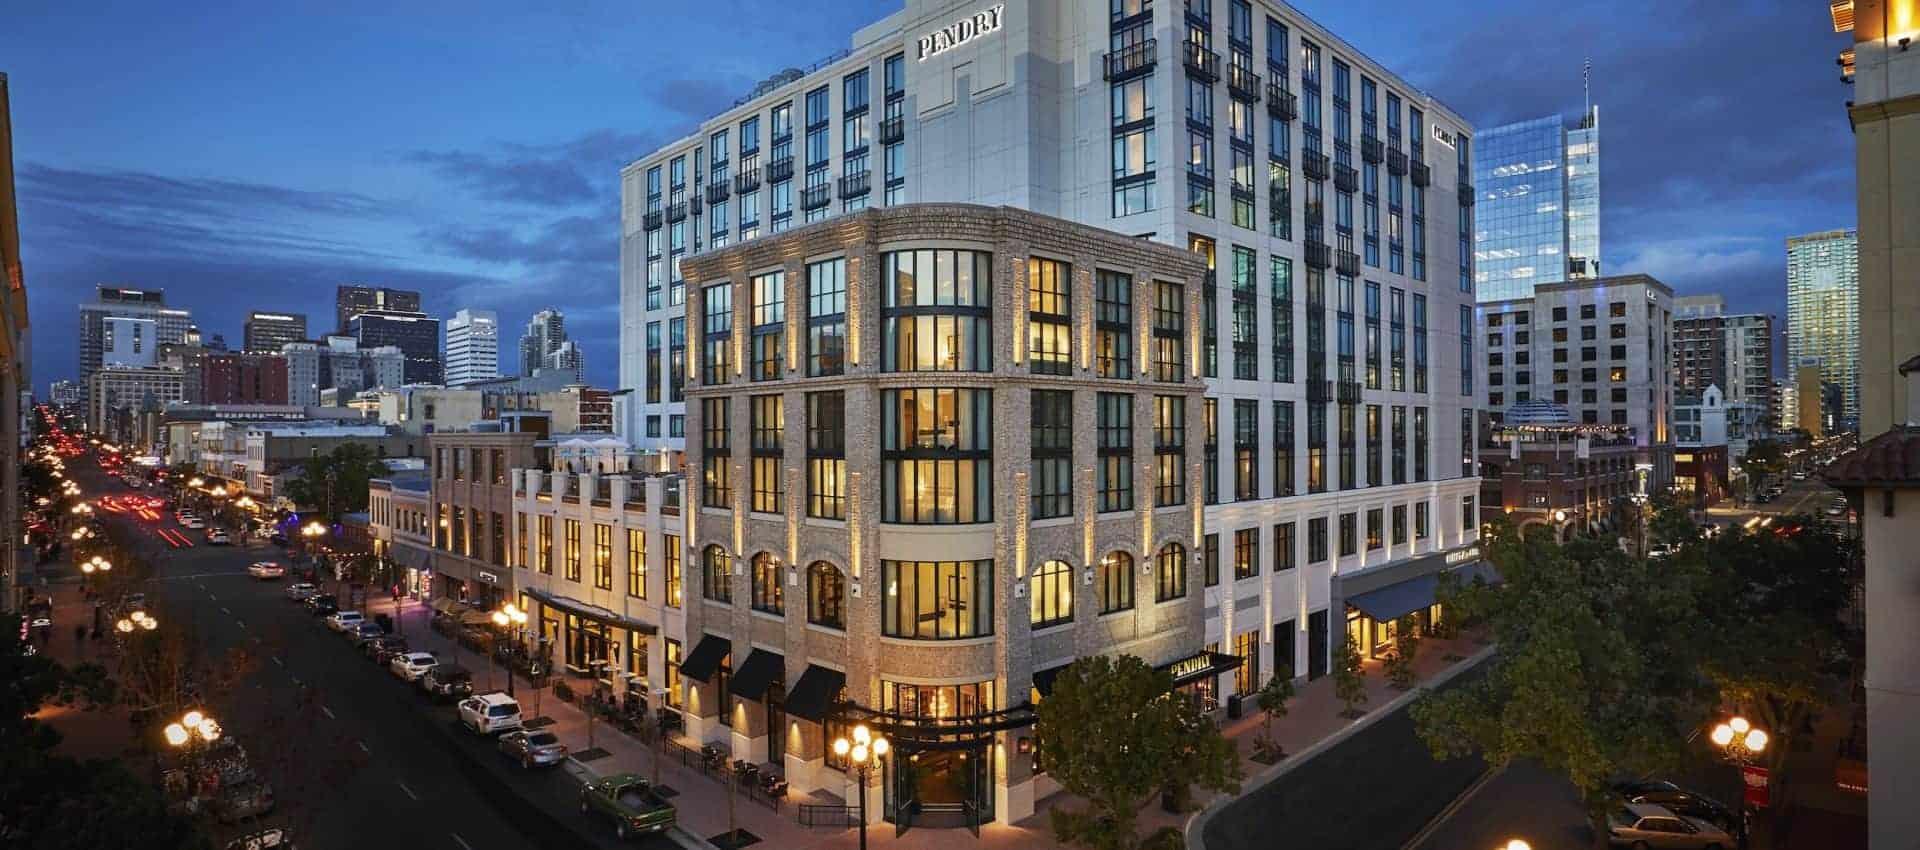 Hotels In San Diego >> San Diego Boutique Hotel Gaslamp Hotels Pendry San Diego